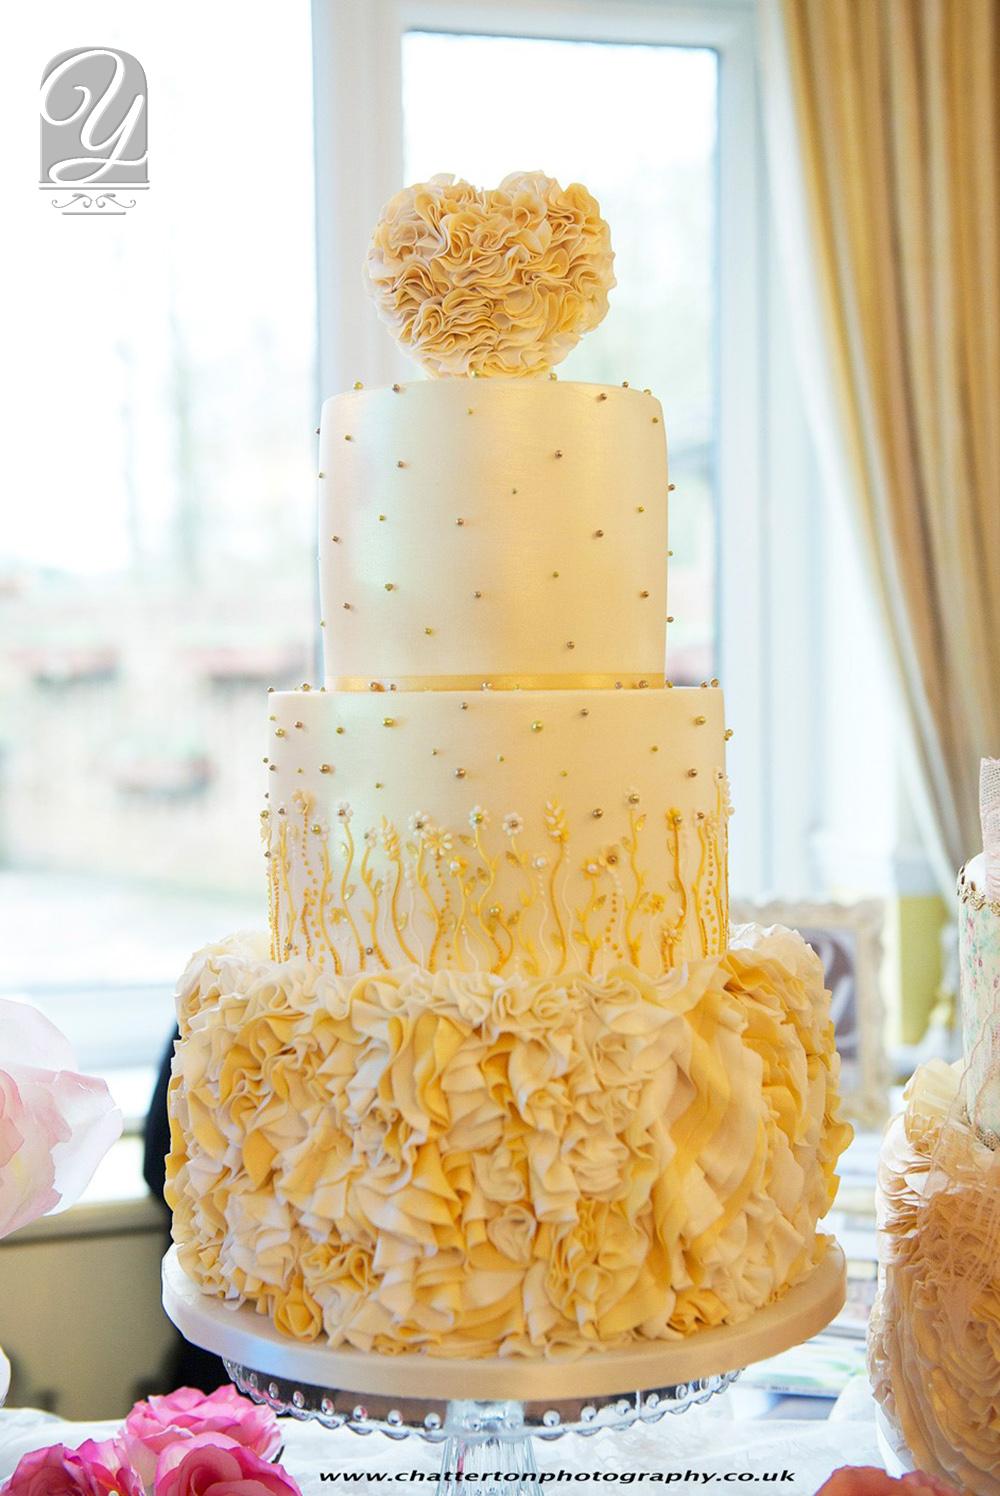 12 Unique Wedding Cakes Gold Photo - Unique Wedding Cake Heart ...